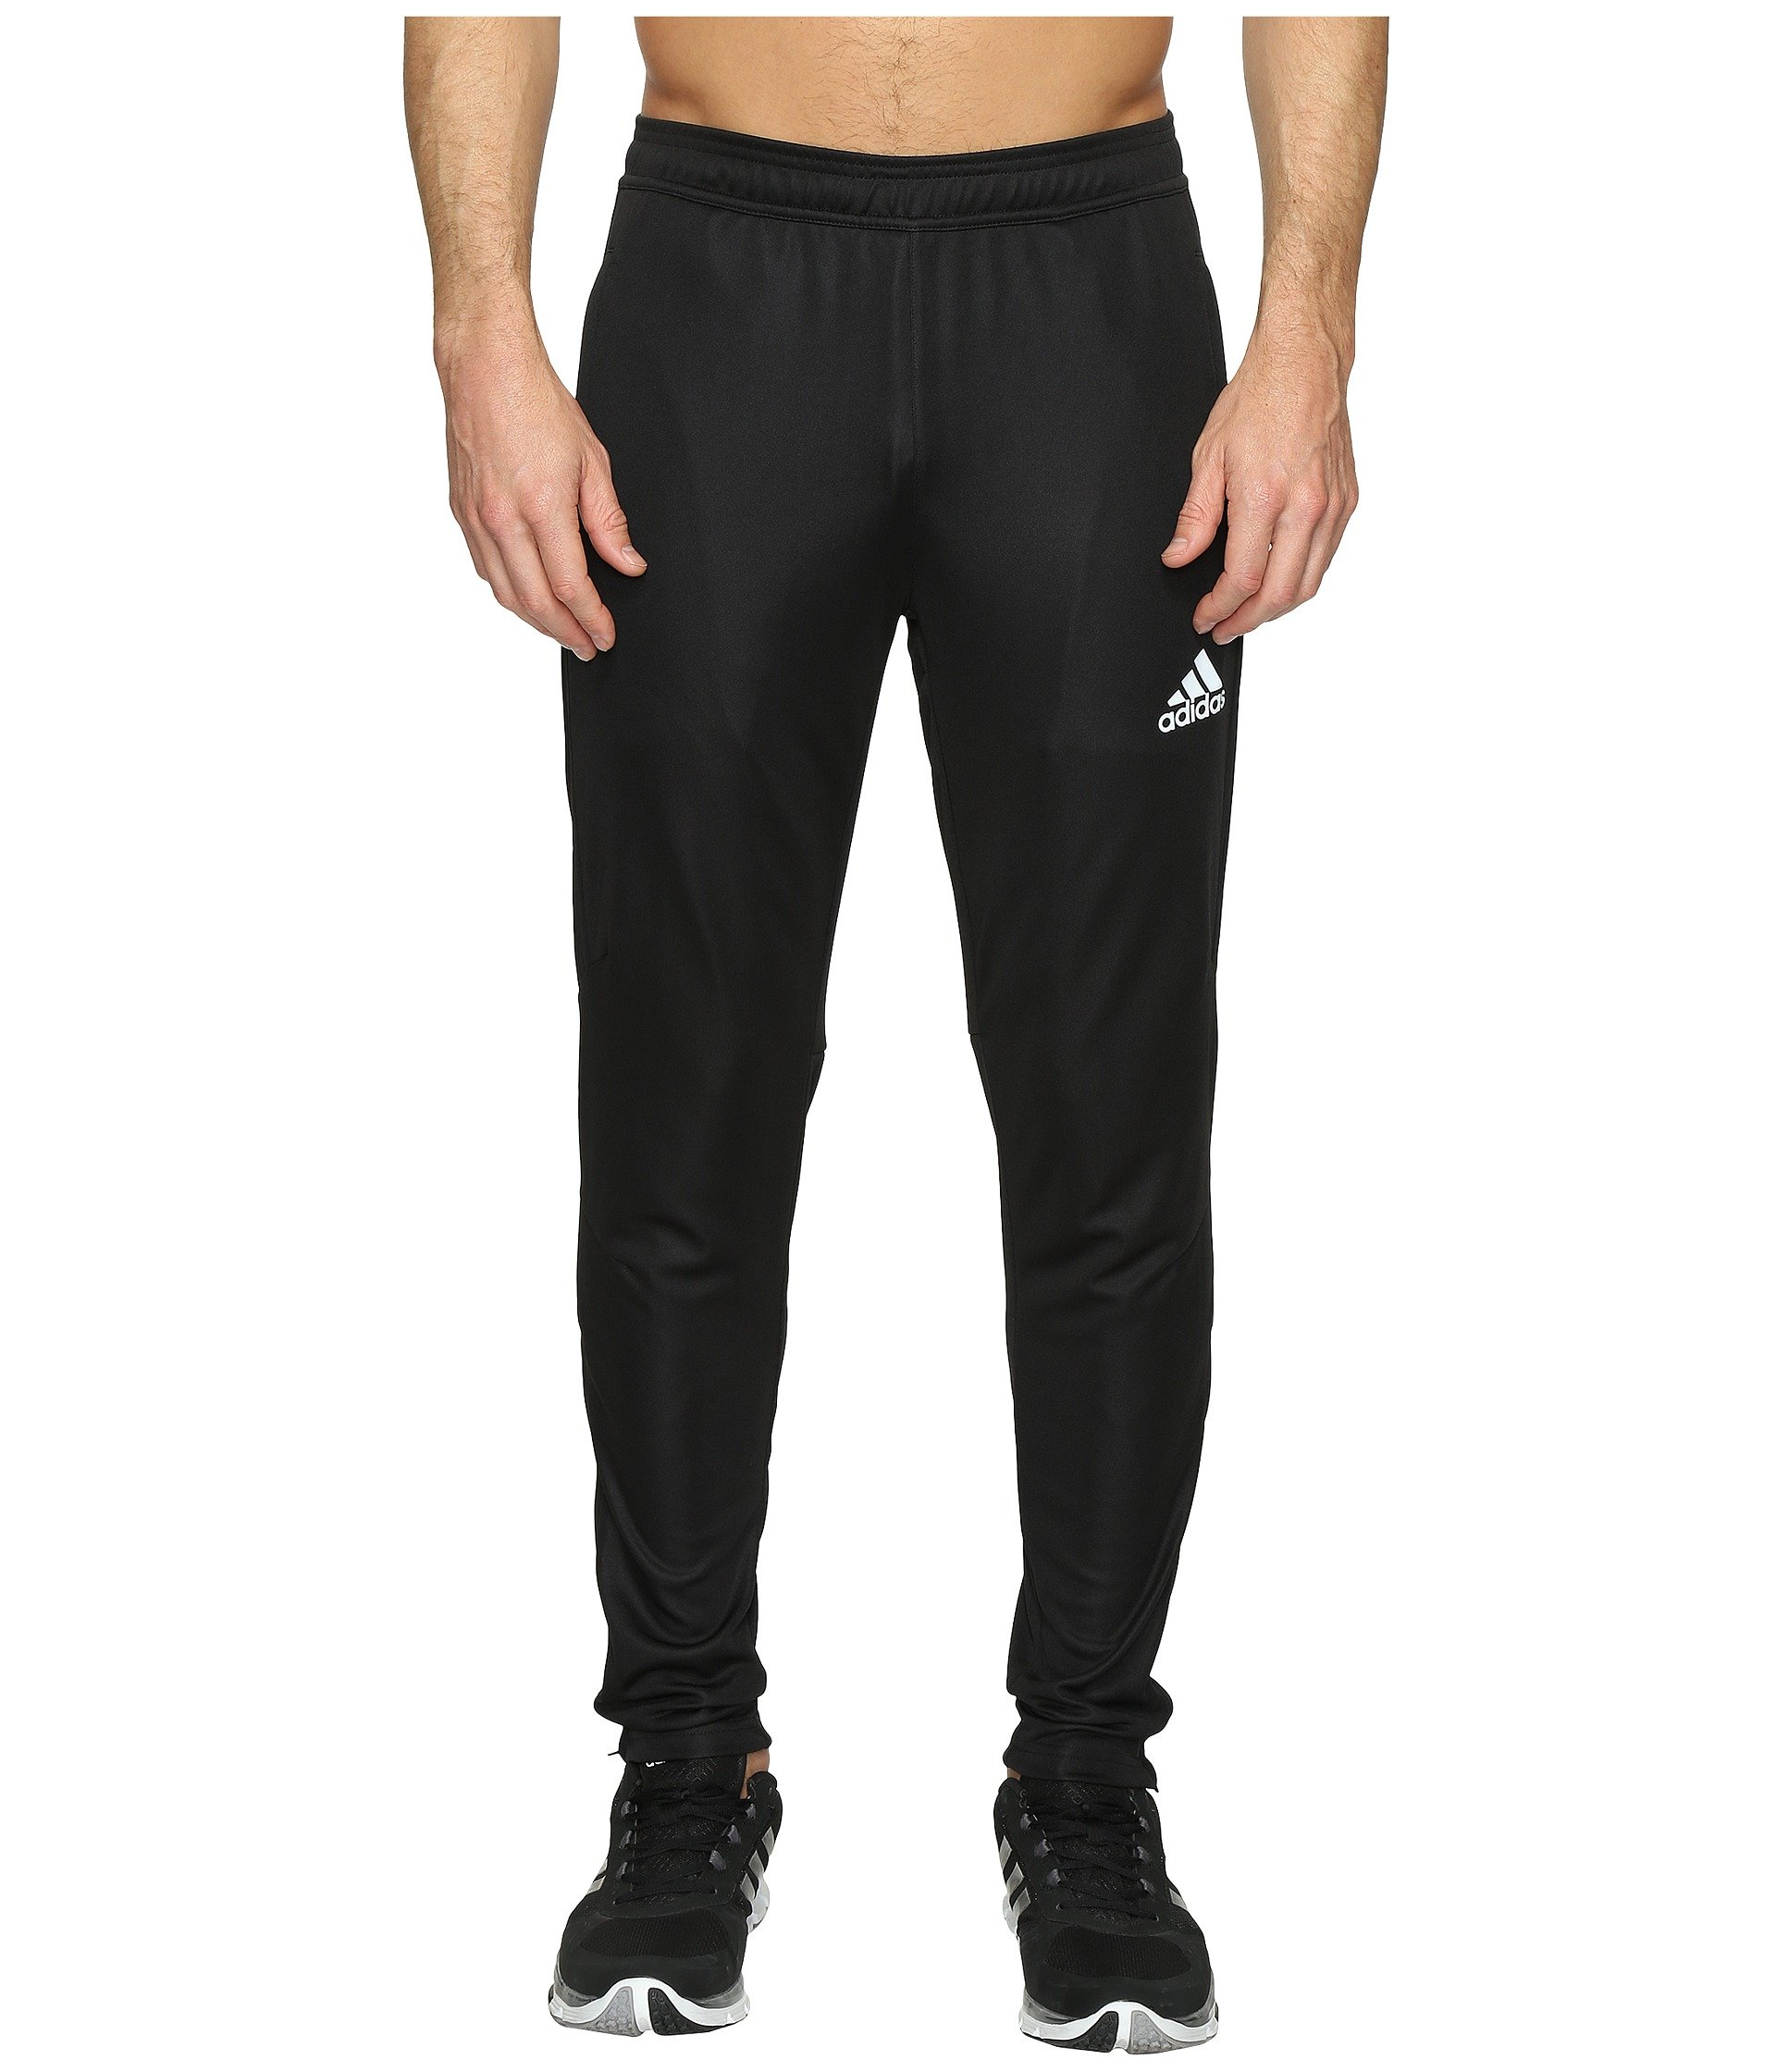 adidas Men's Soccer Tiro 17 Pants, Medium, Black/White